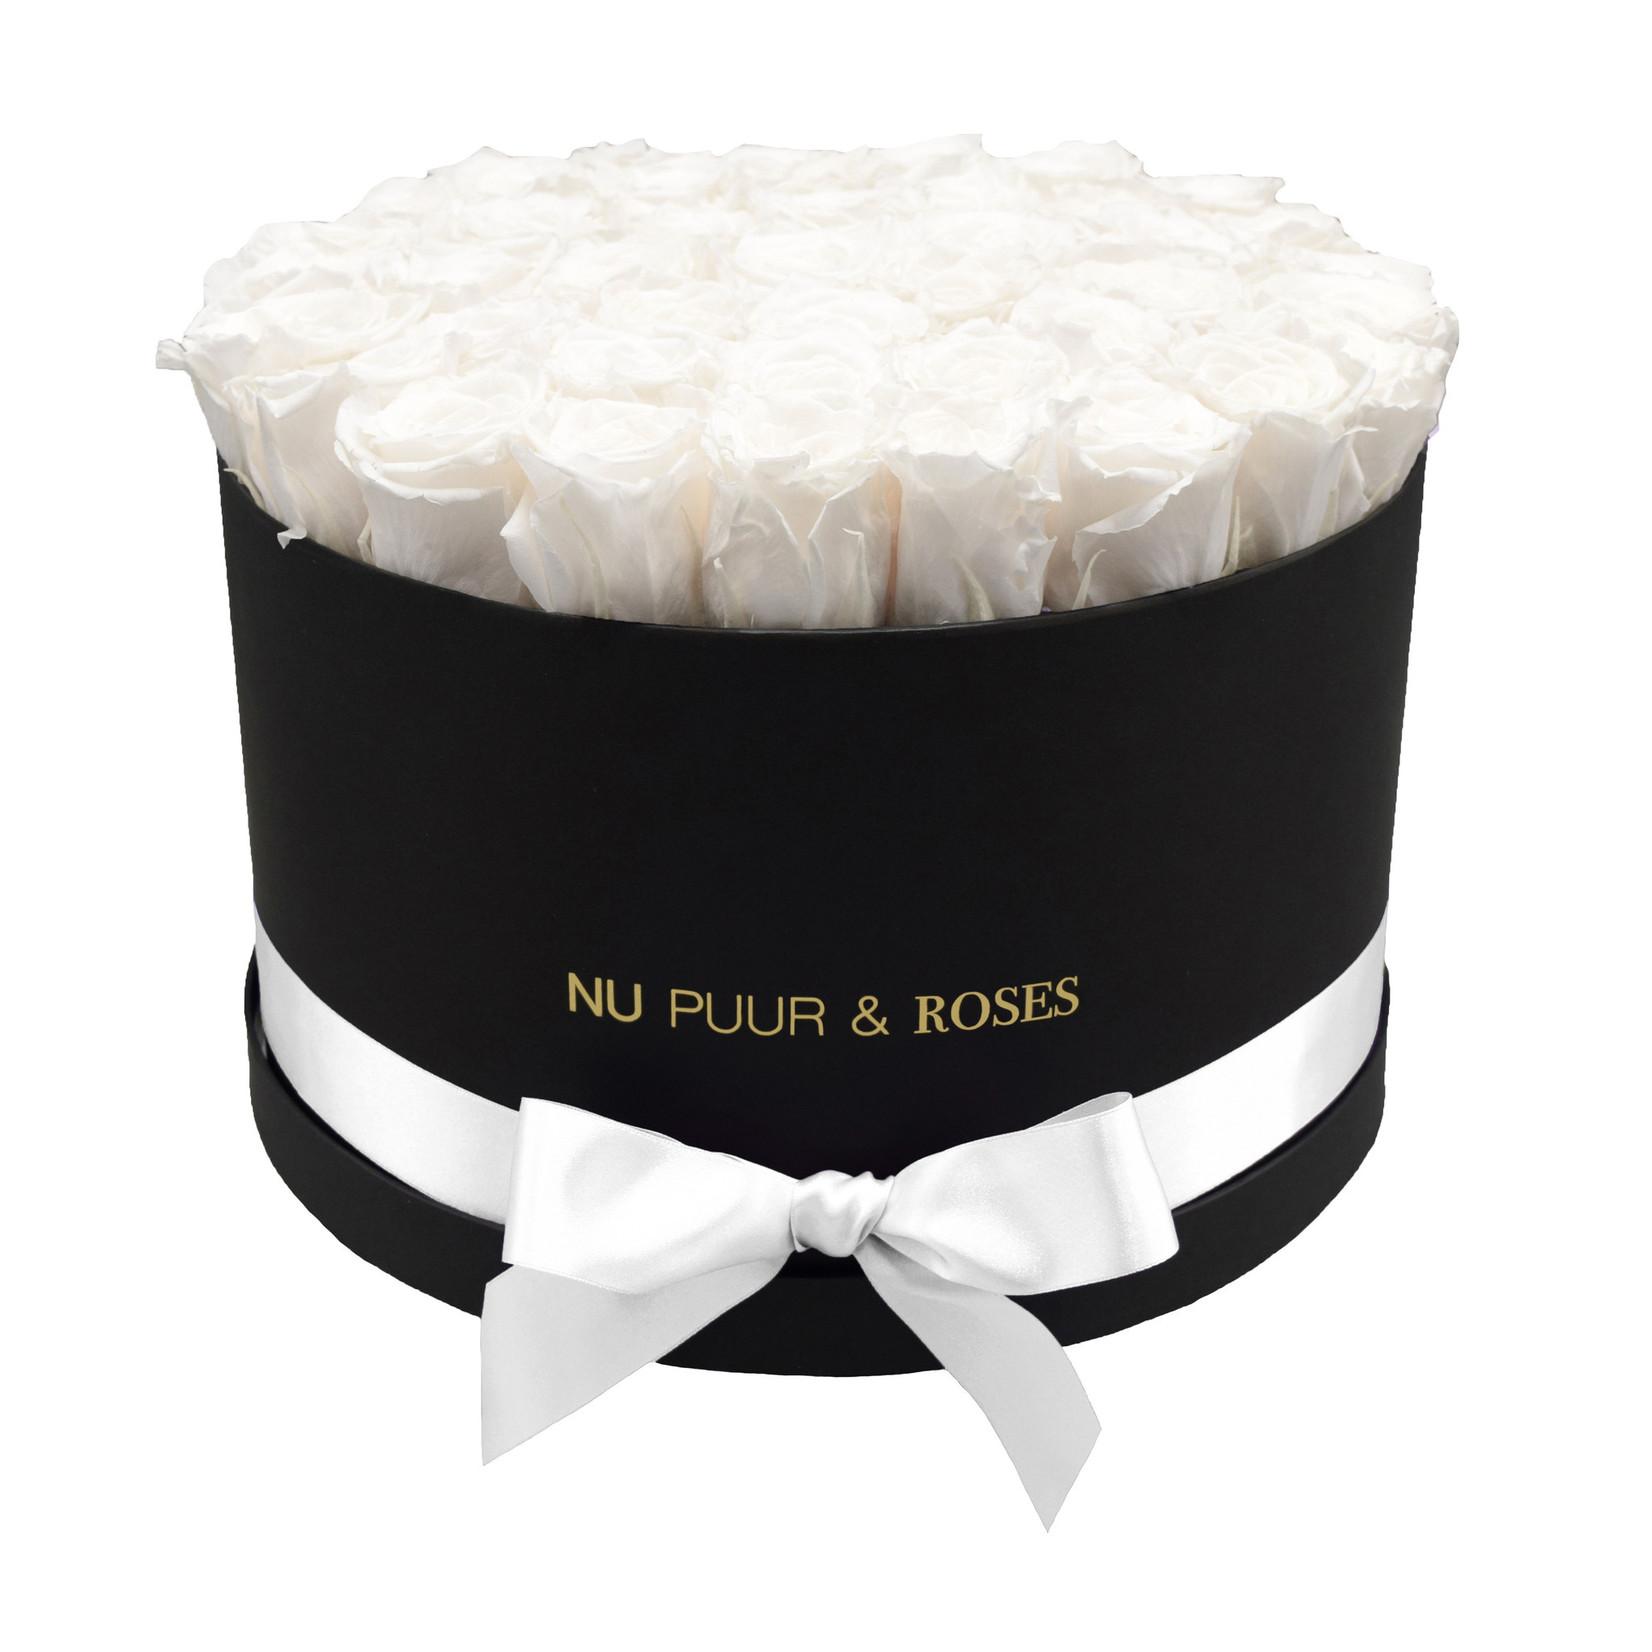 Extra Large - White Endless Roses - Black Box